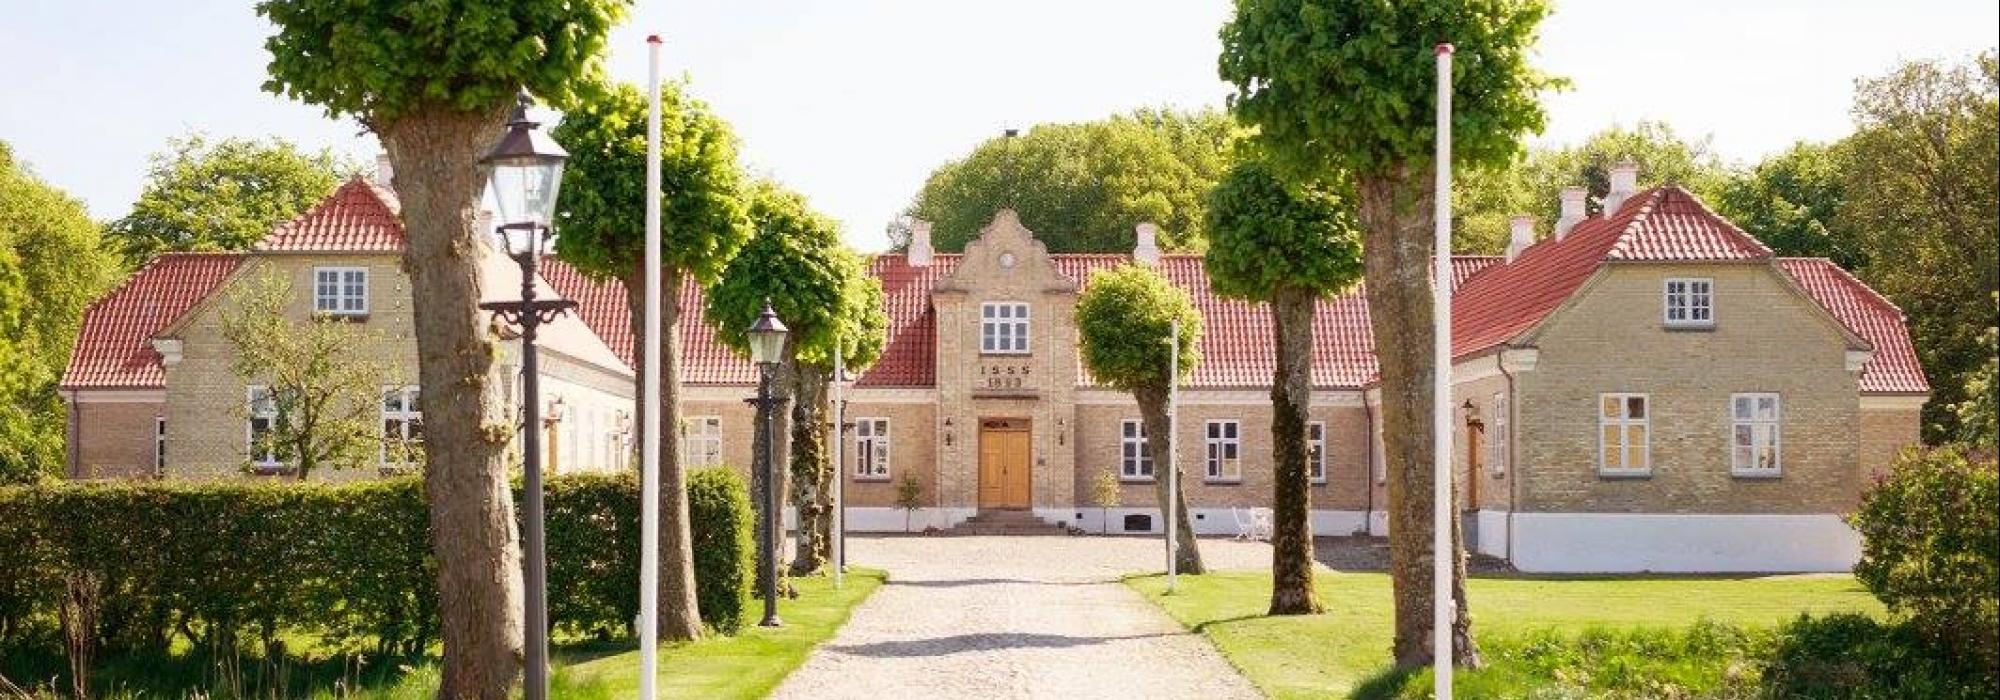 Ullerup Hovedgaard